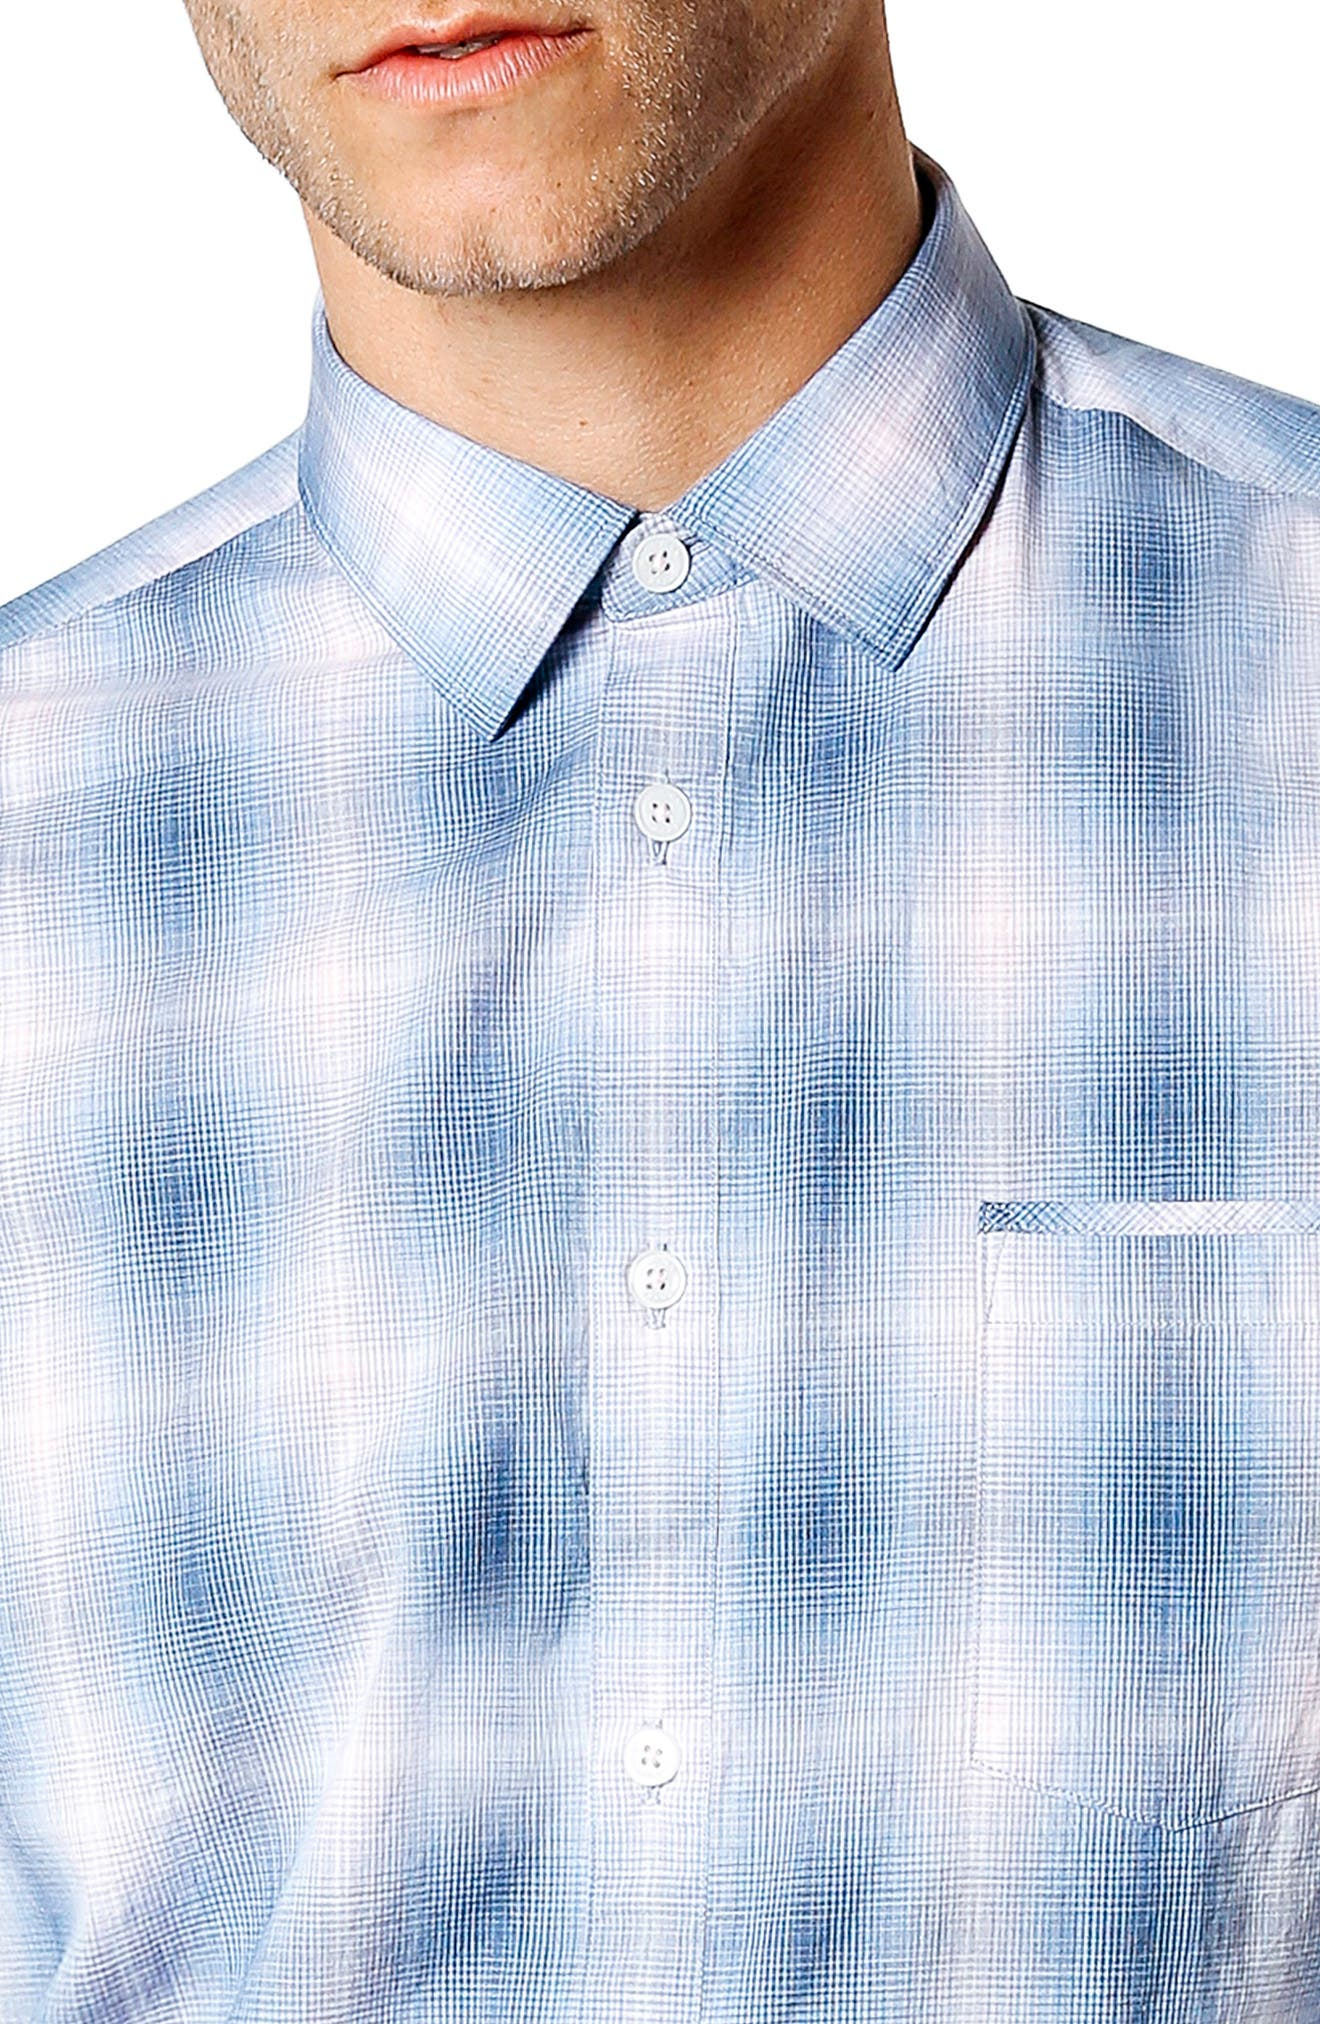 Sunset Slim Fit Sport Shirt,                             Alternate thumbnail 4, color,